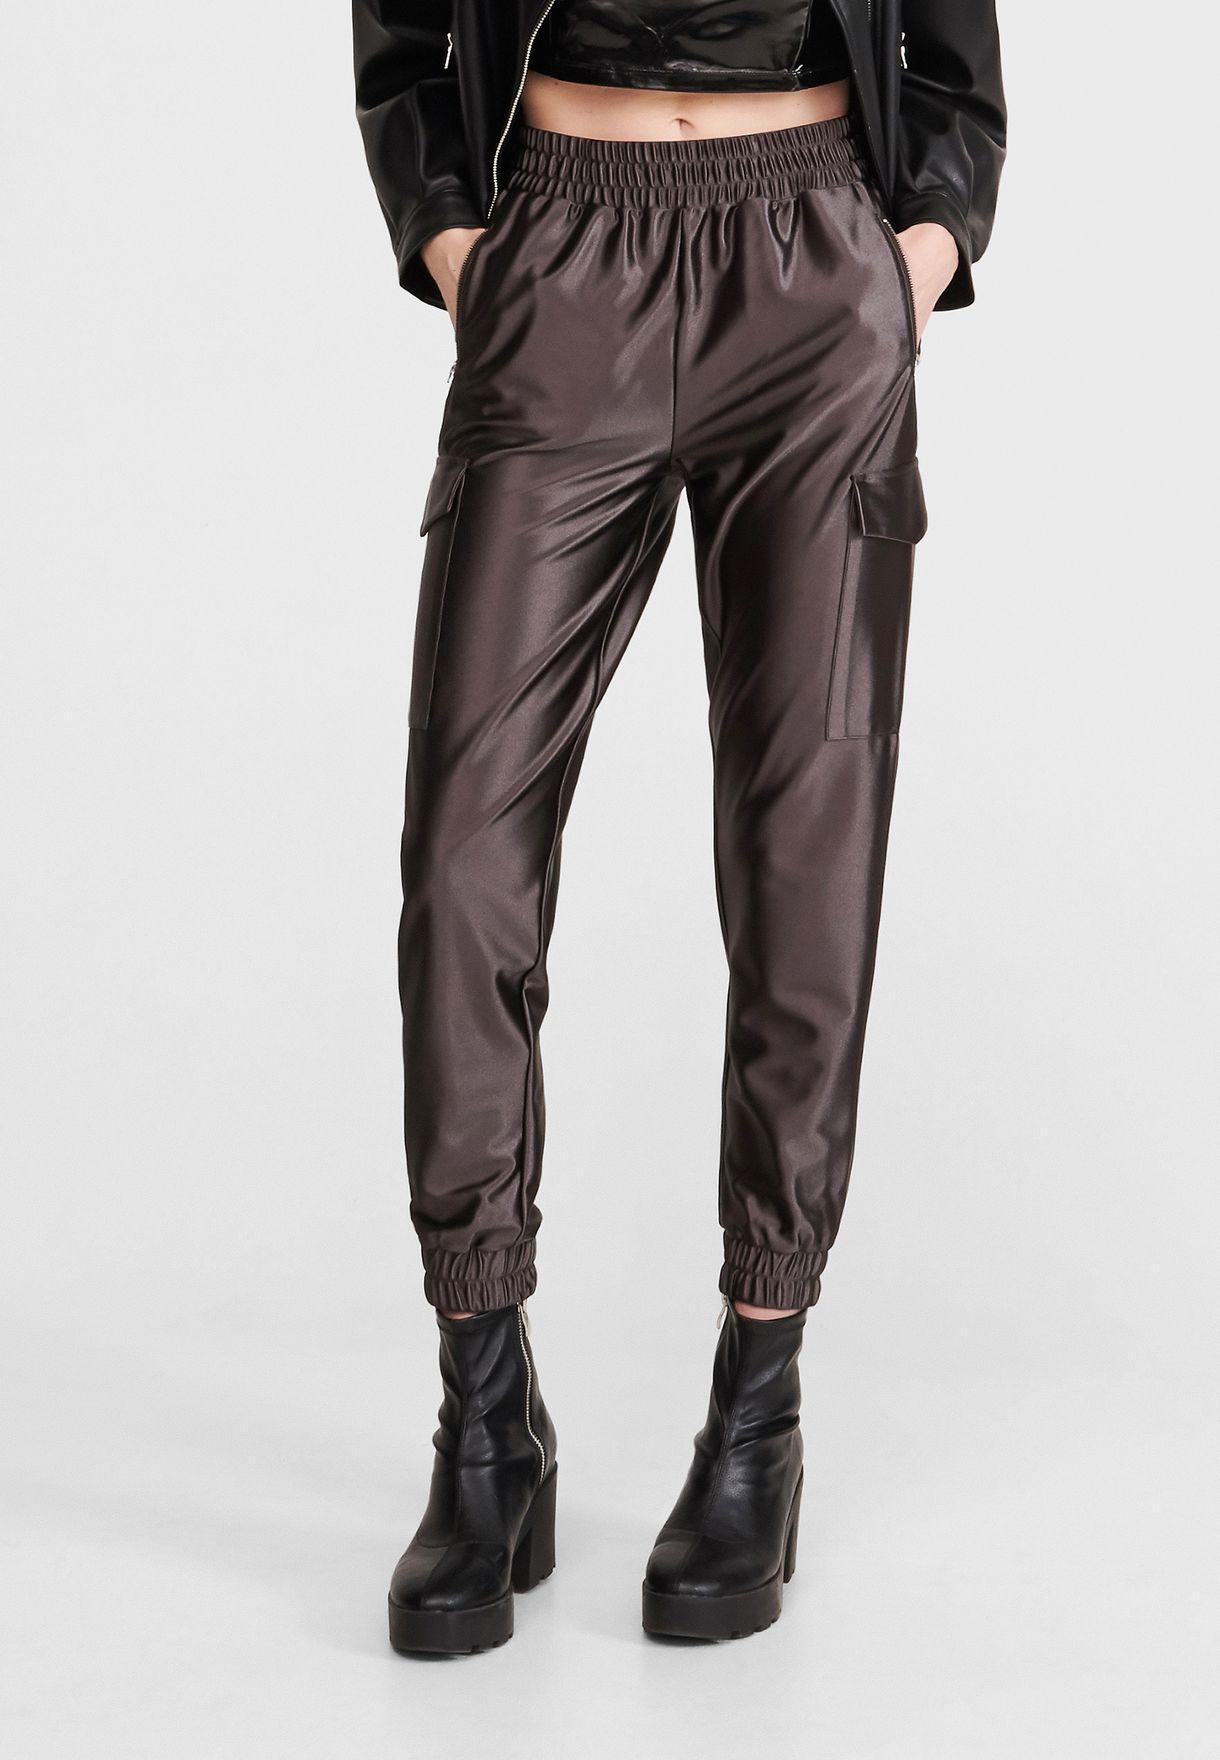 Pocket Detail Cuffed Pants